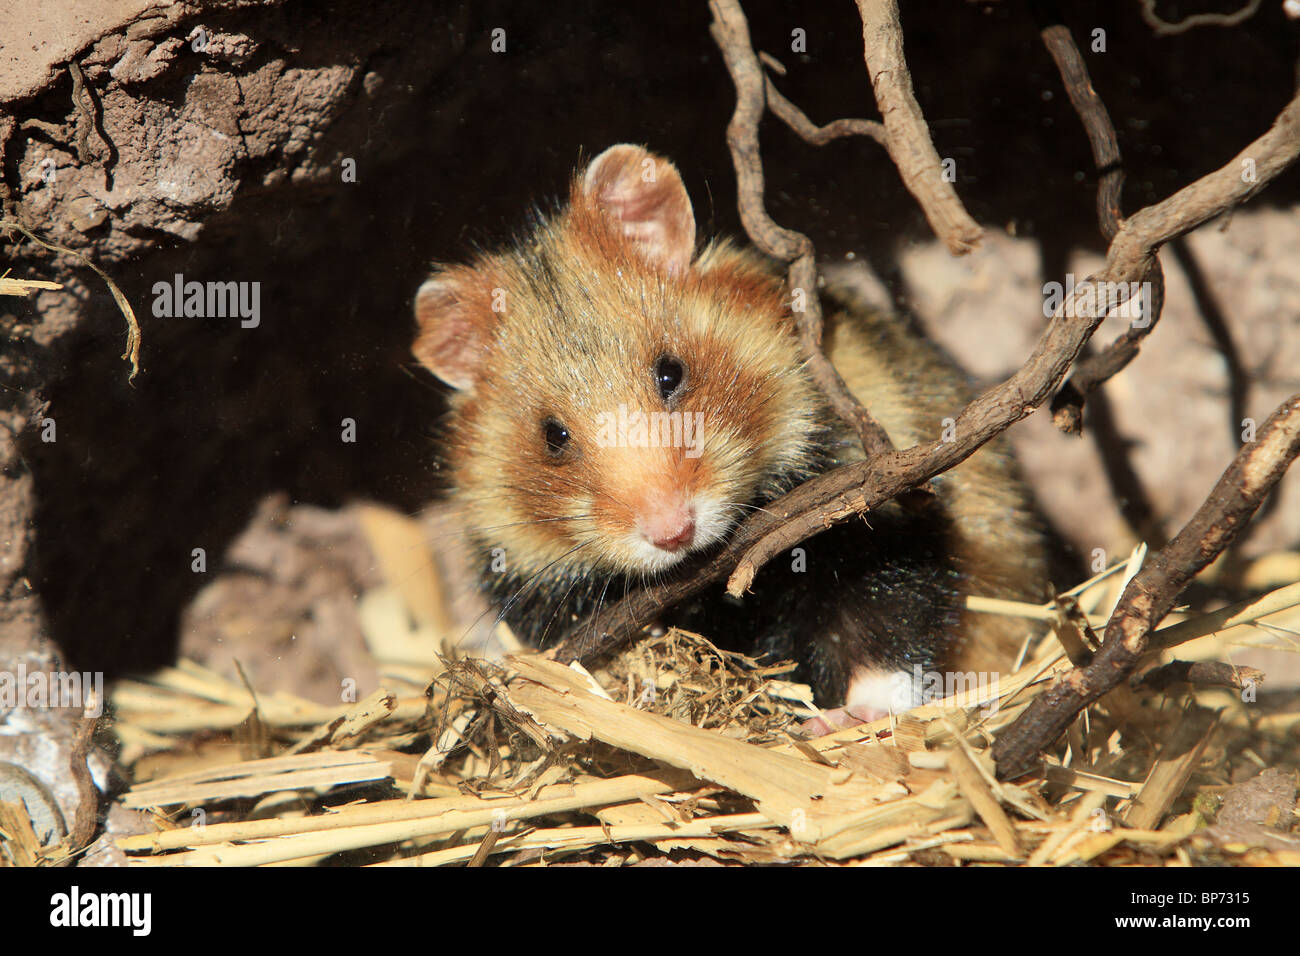 European Hamster, Black-bellied Hamster, Common Hamster (Cricetus cricetus) in its den. - Stock Image